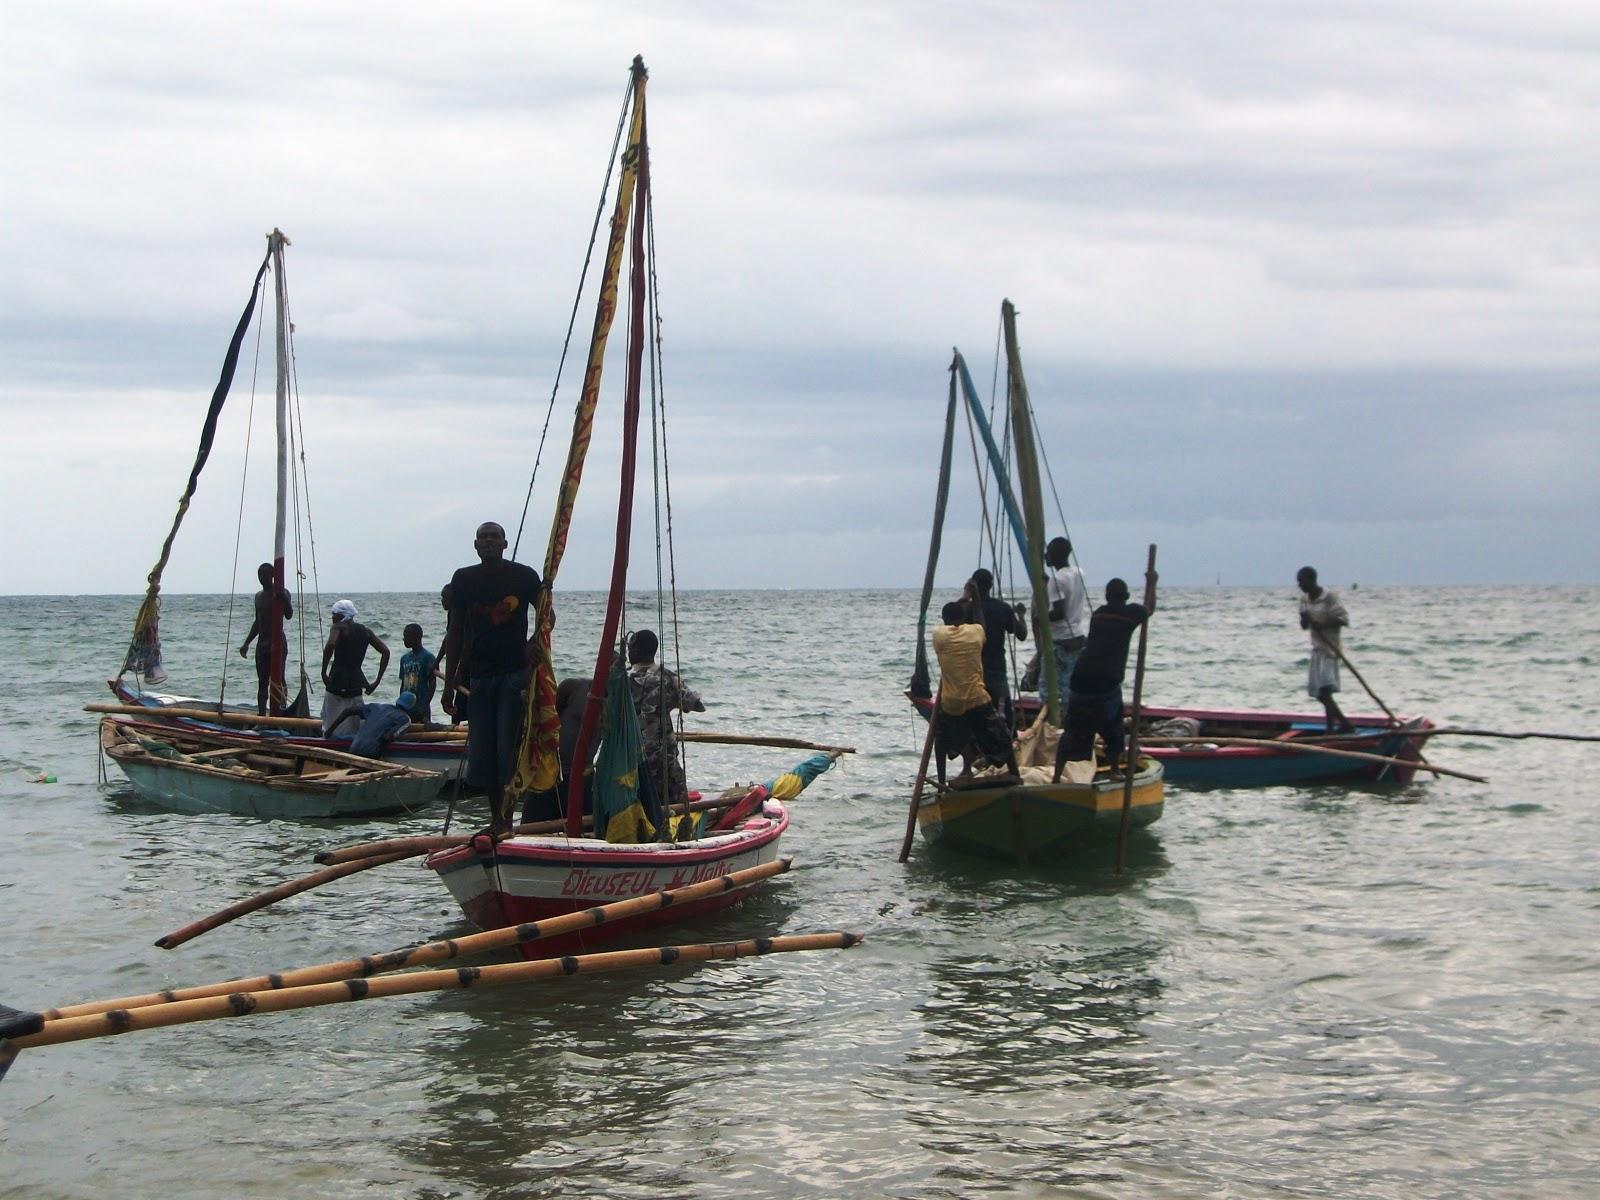 Festival de la mer au Cap-Haitien  :13 au 15 juille saki rete anko  nan vil Okap 100_3366